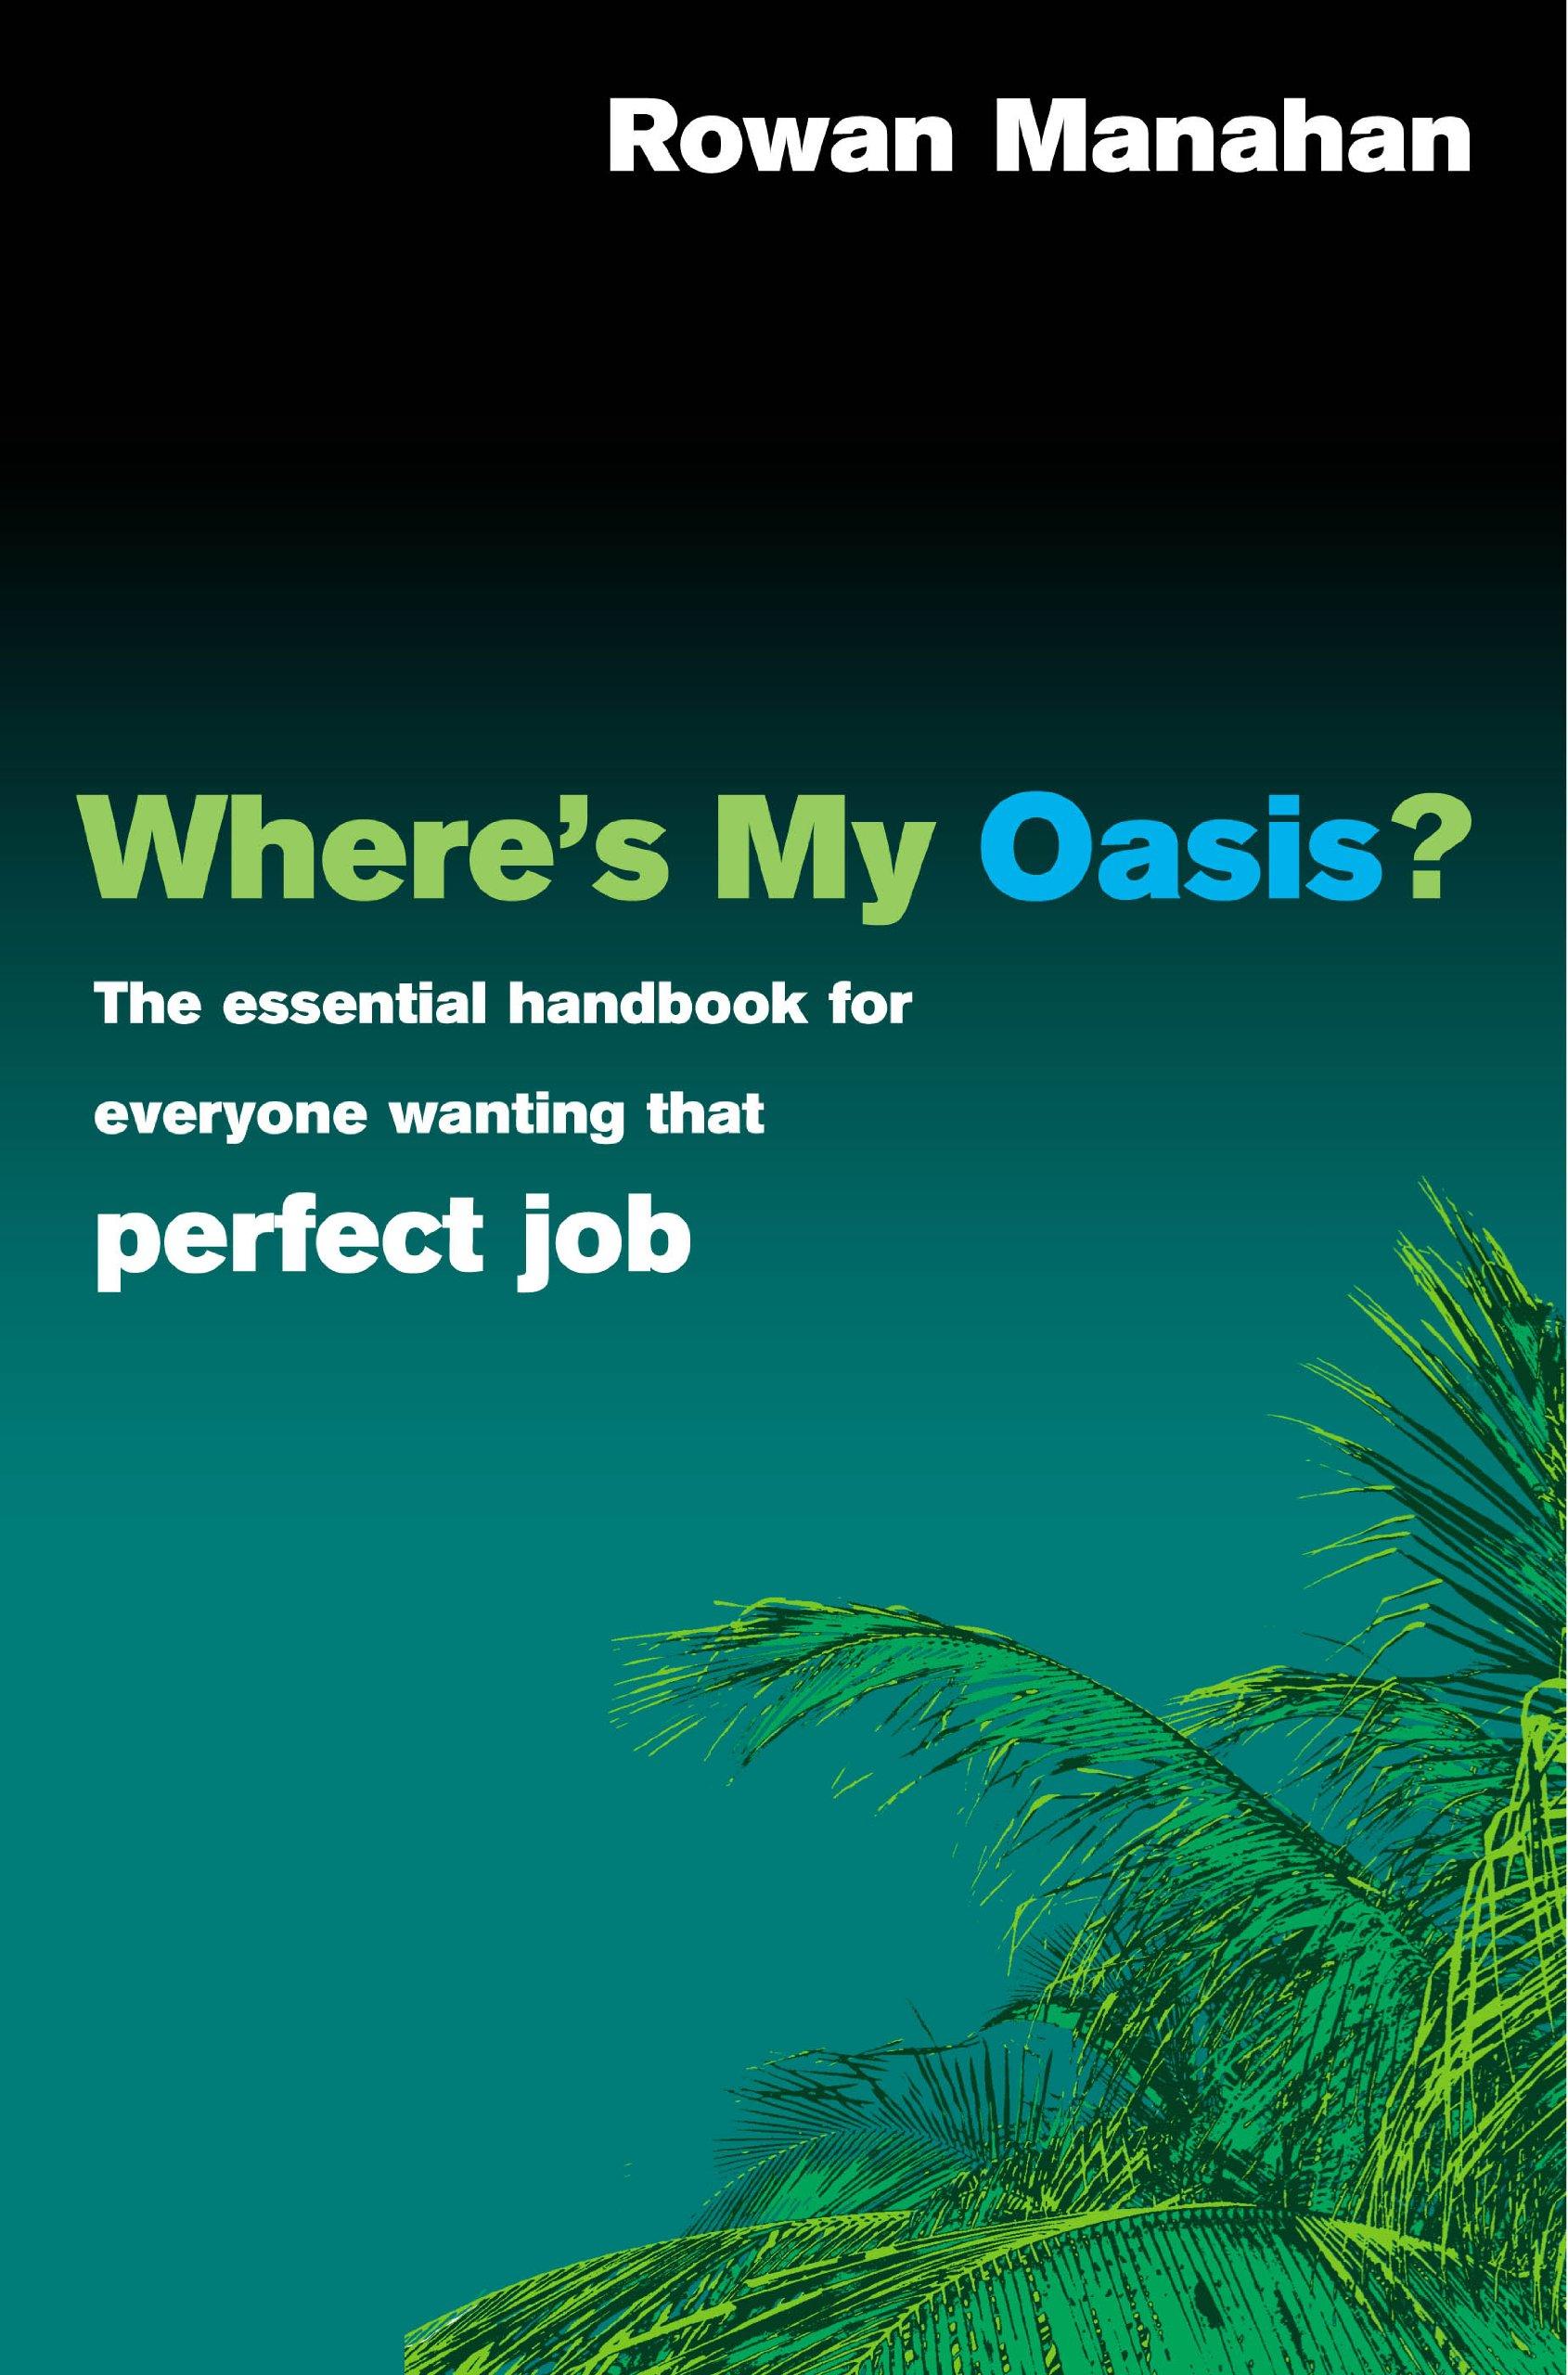 Where's My Oasis ePub fb2 ebook